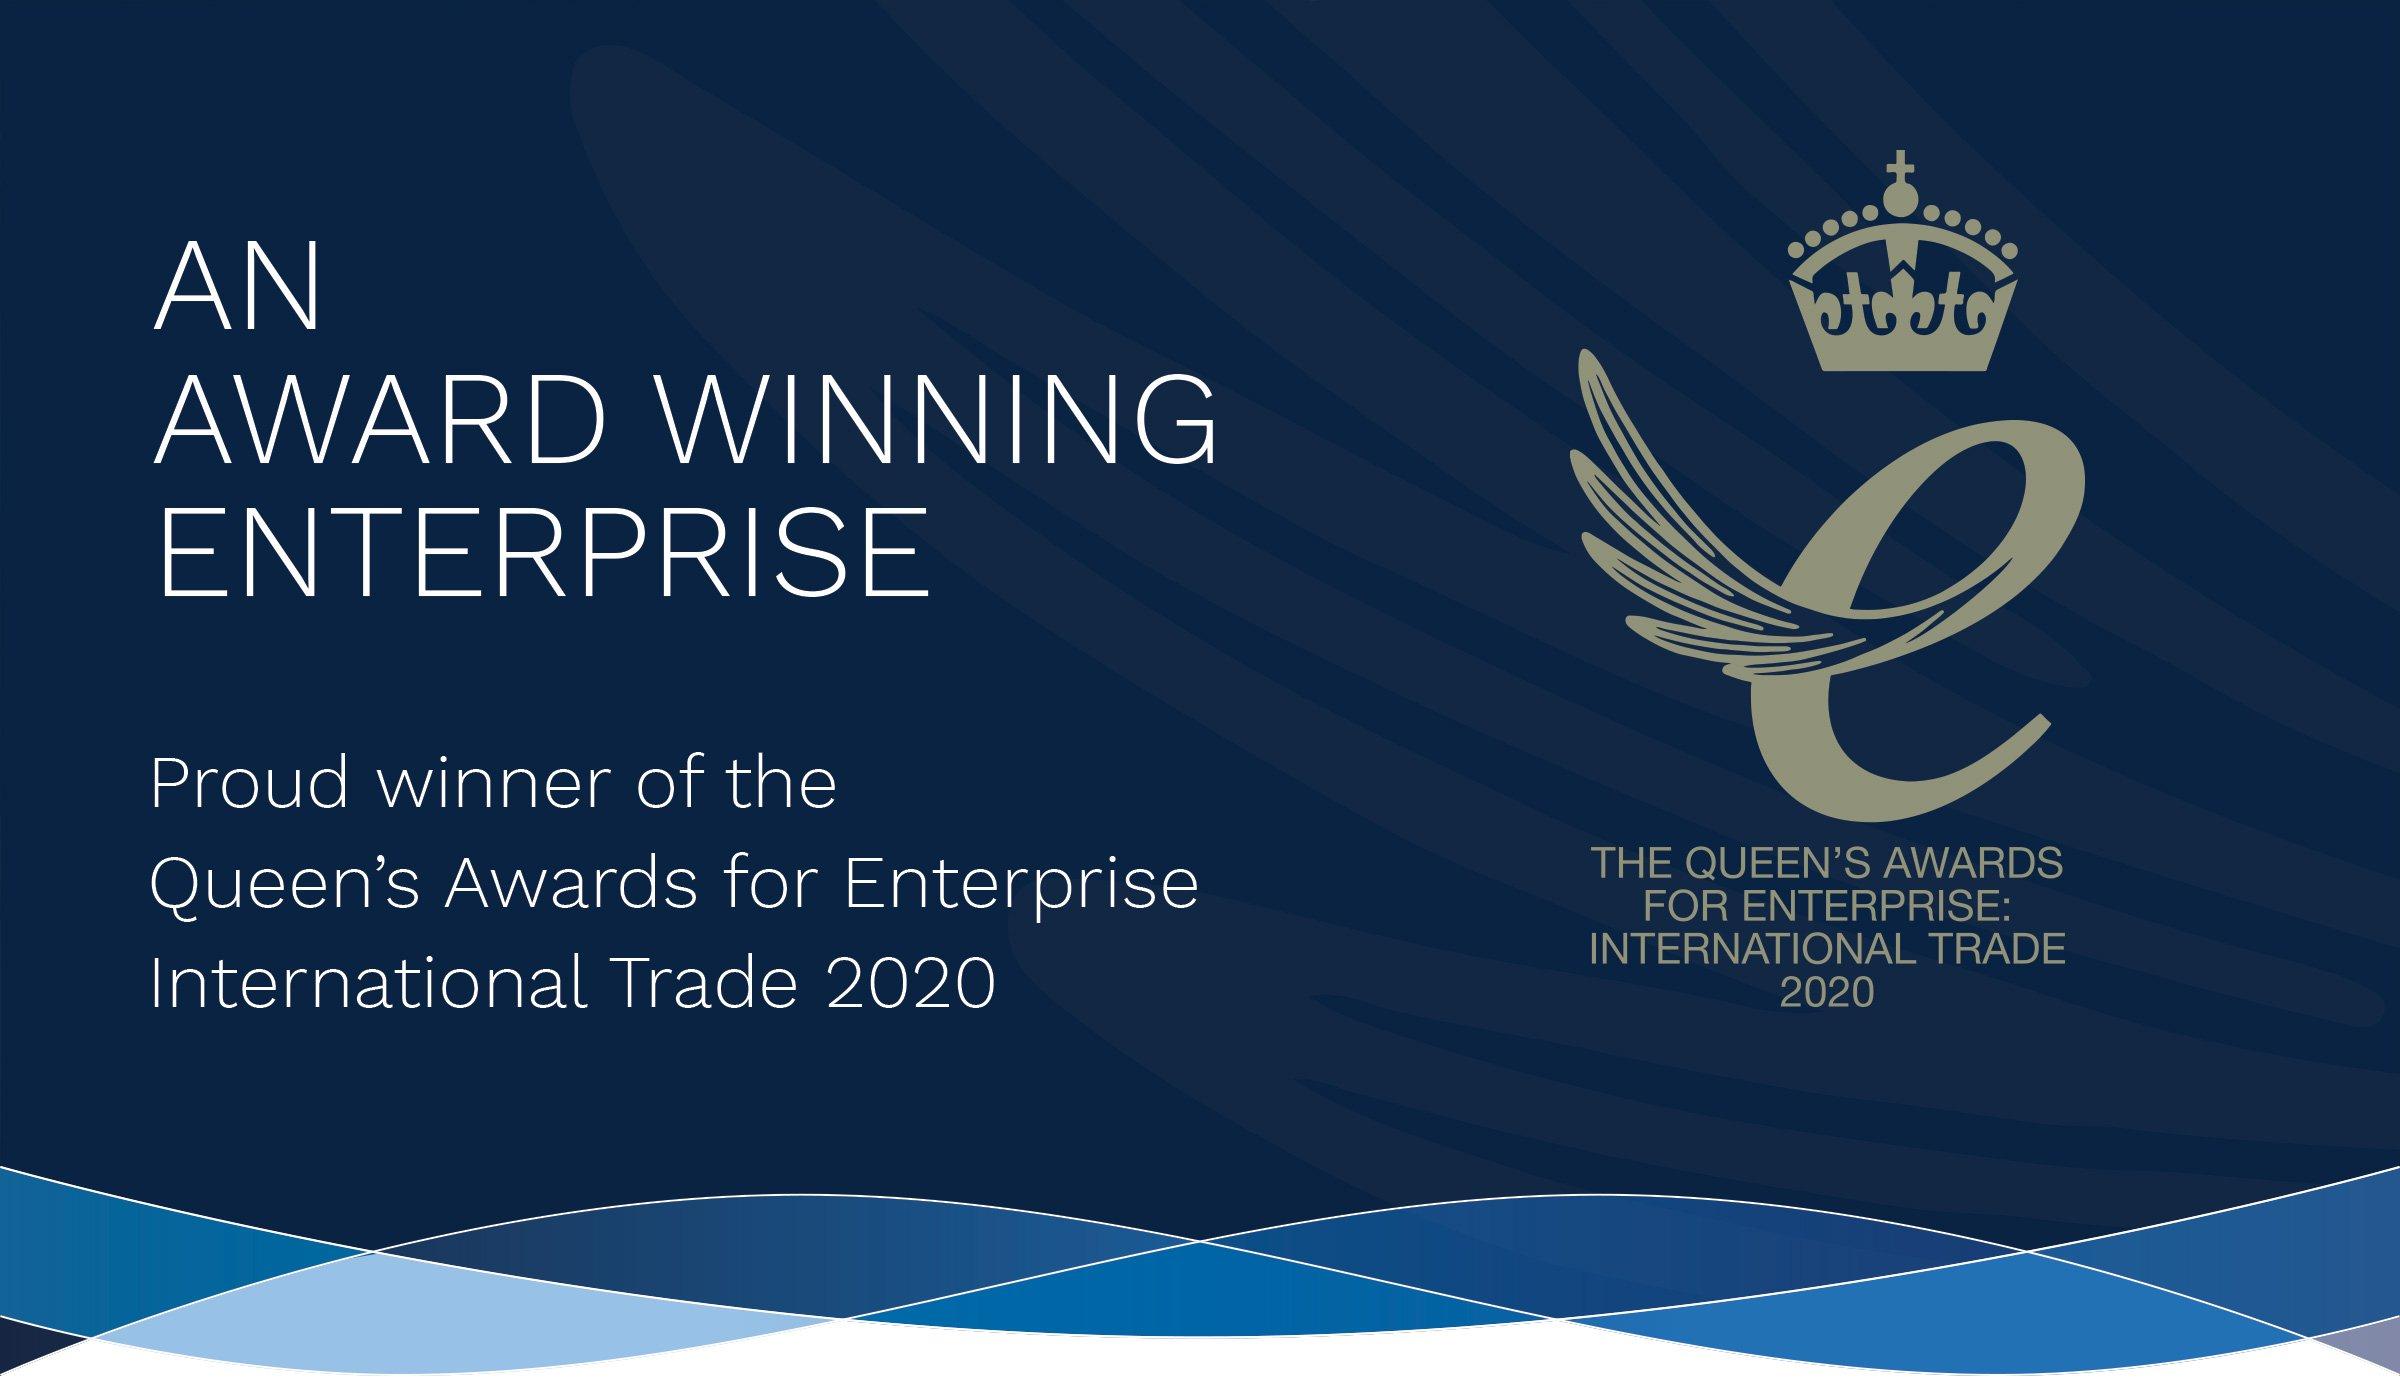 Hardide Coatings - Proud winner of The Queen's Award for Enterprise International Trade 2020